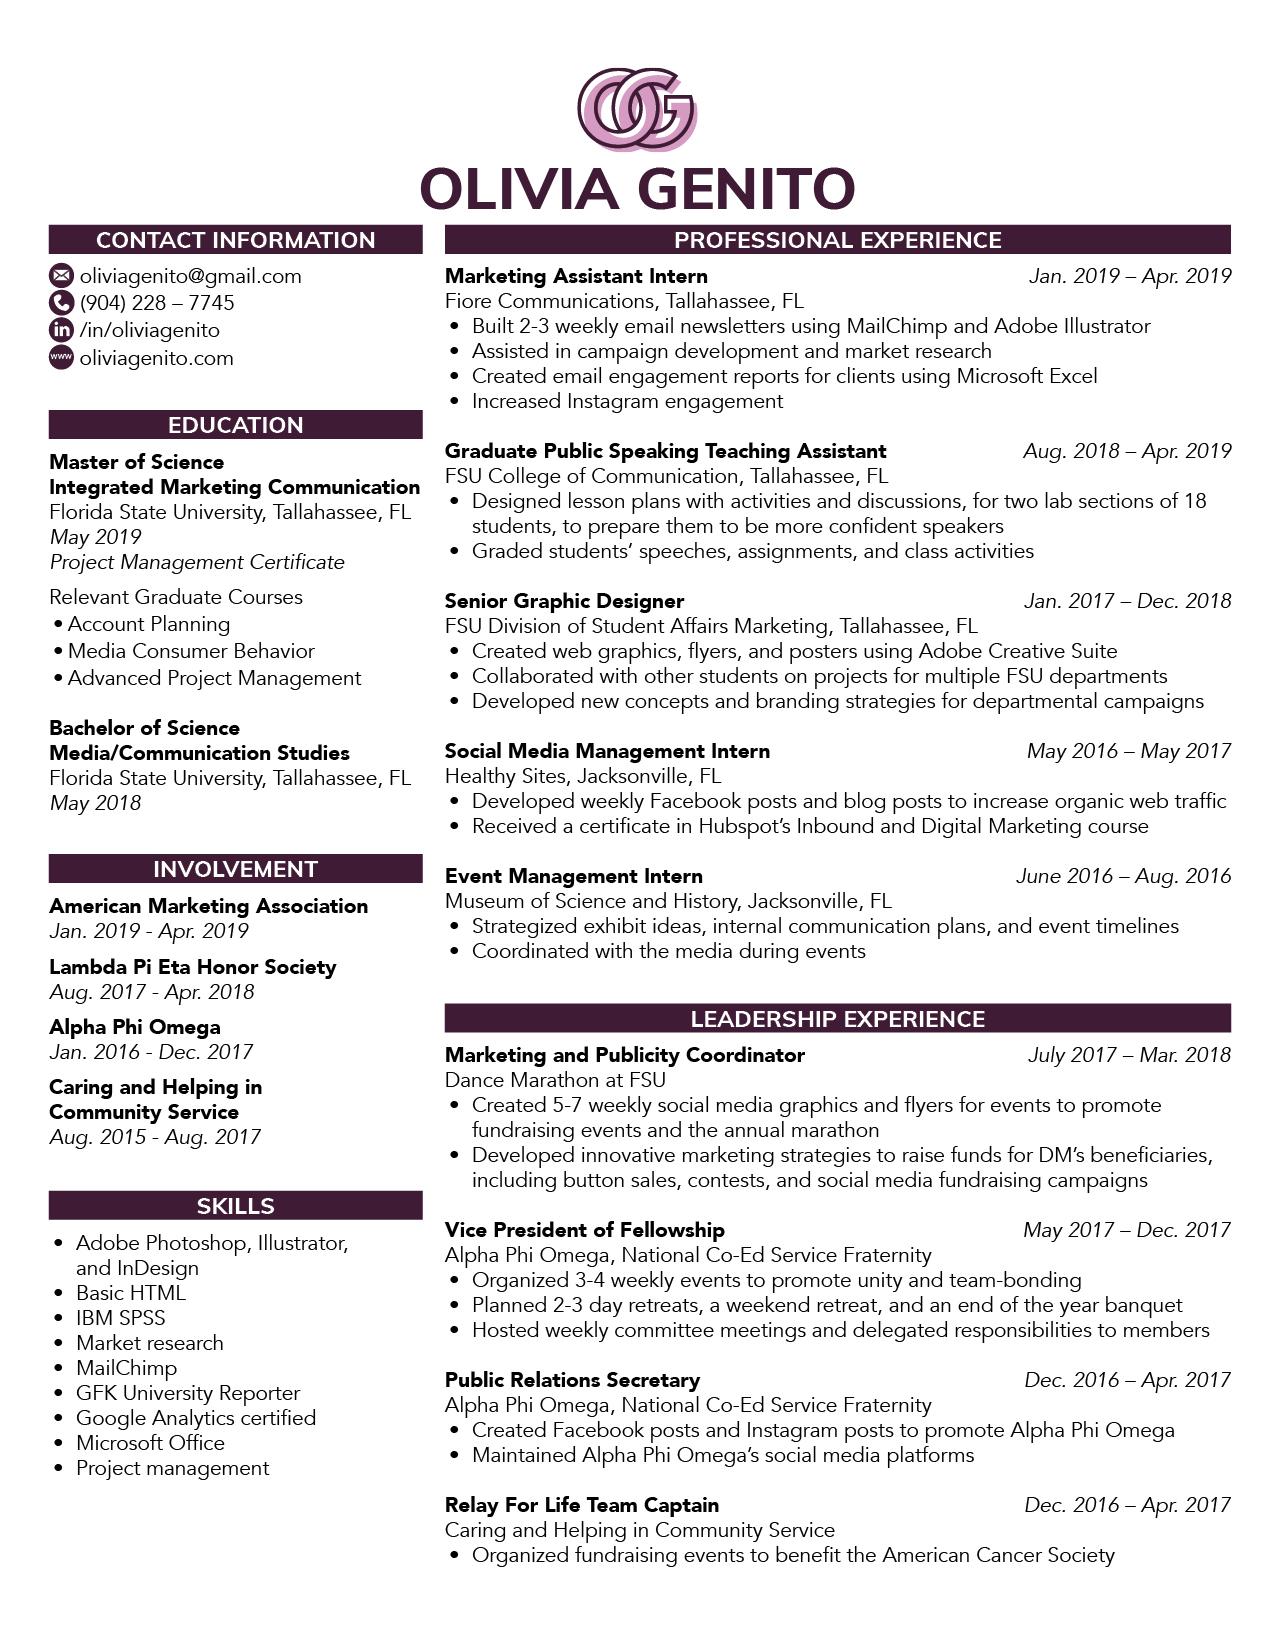 Resume — OLIVIA GENITO